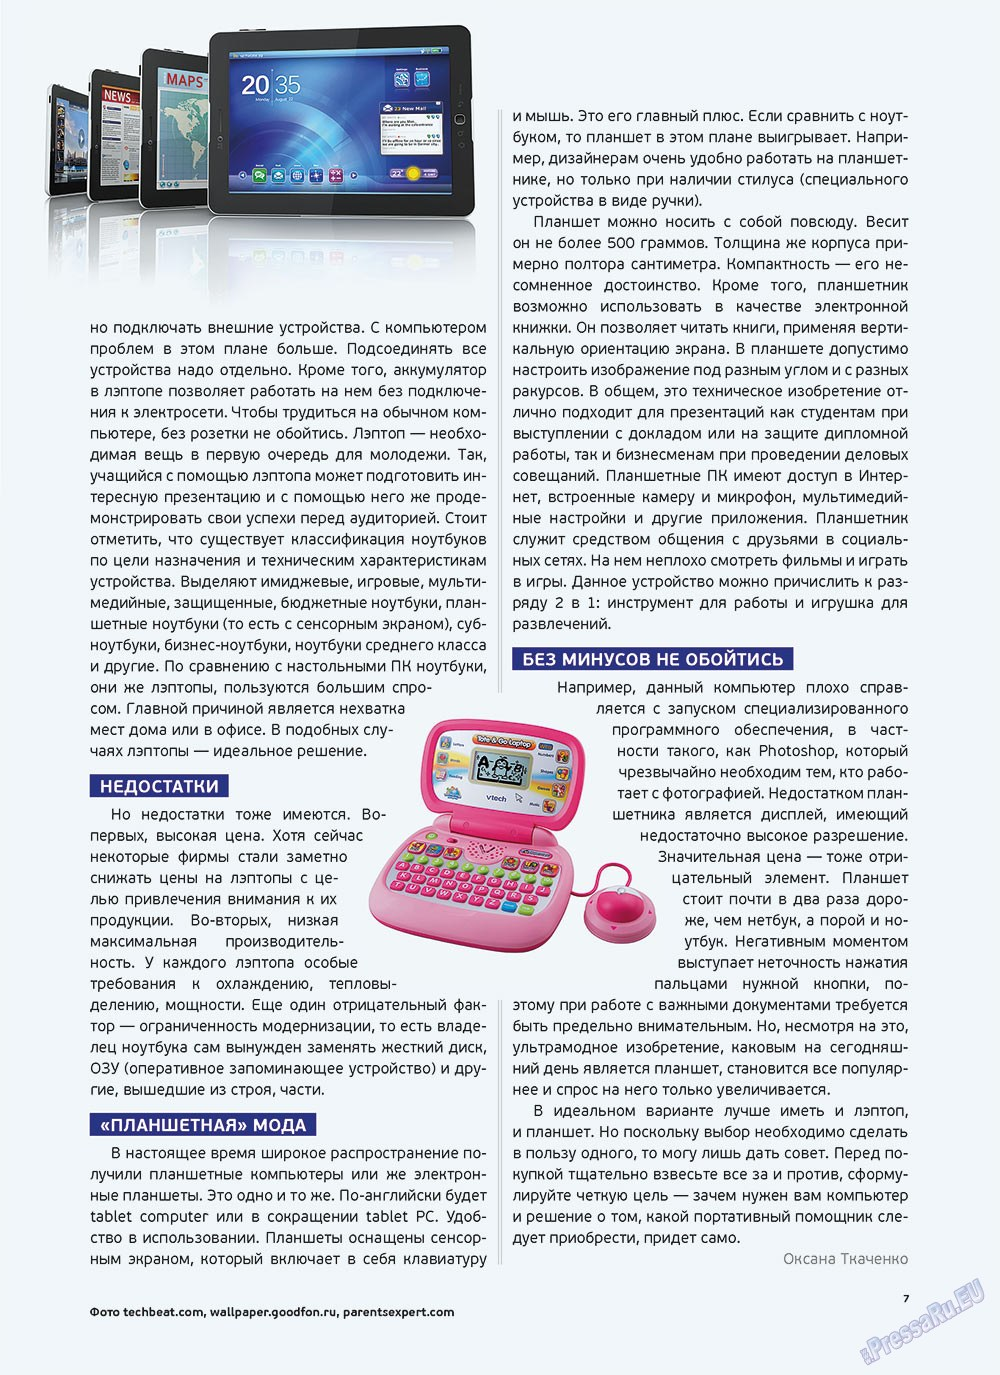 Артек (журнал). 2012 год, номер 6, стр. 9